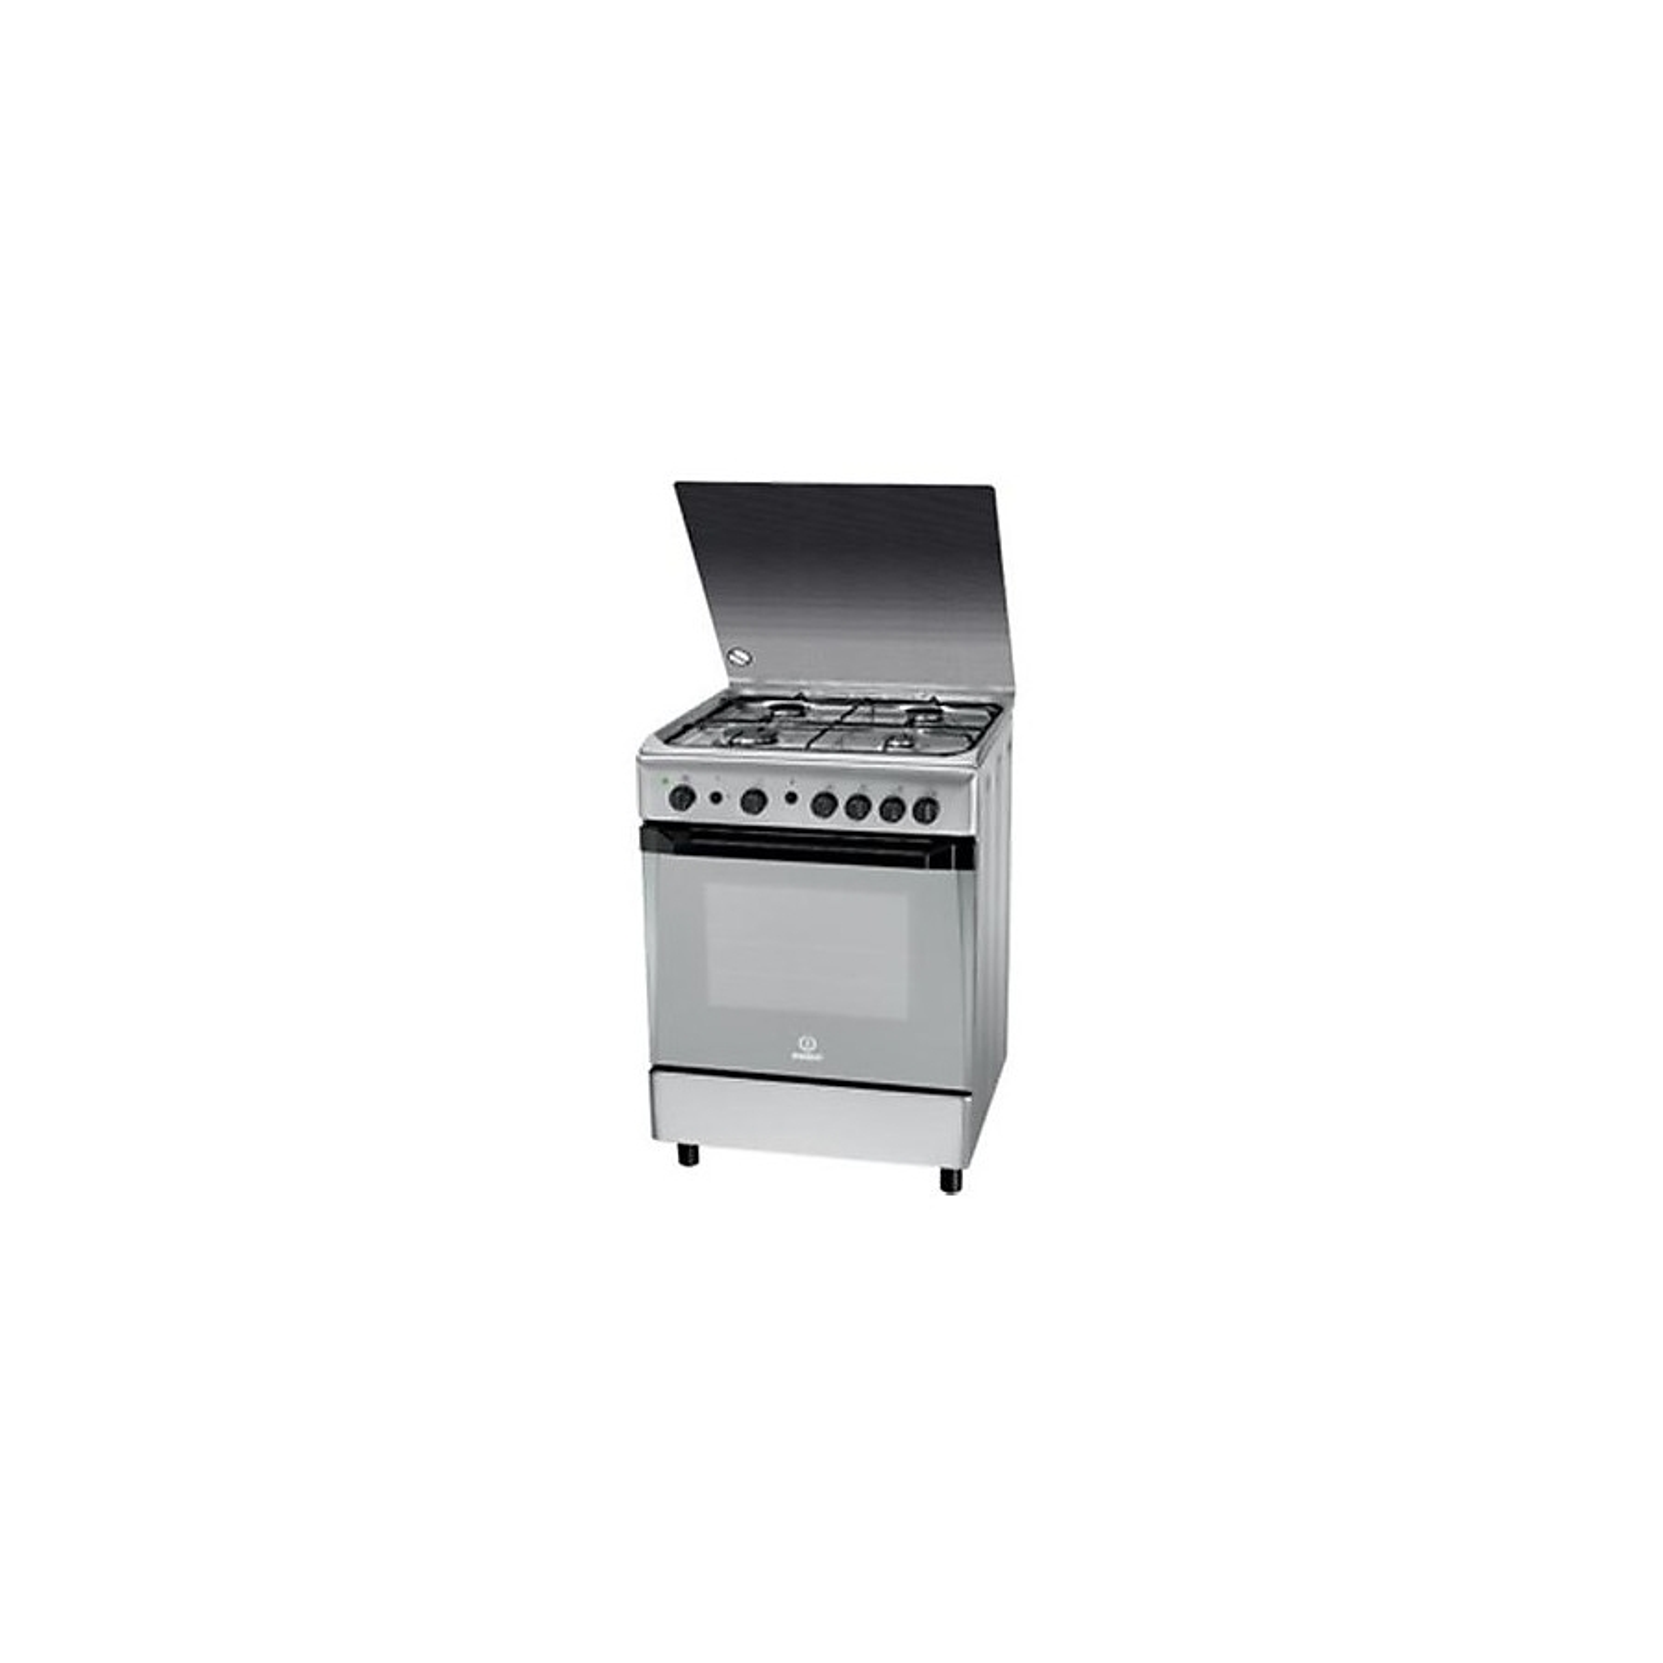 Hotpoint cucina a gas kn6g21s x i s colore inox 60x60cm garanzia italia elettrovillage - Cucine a gas samsung ...